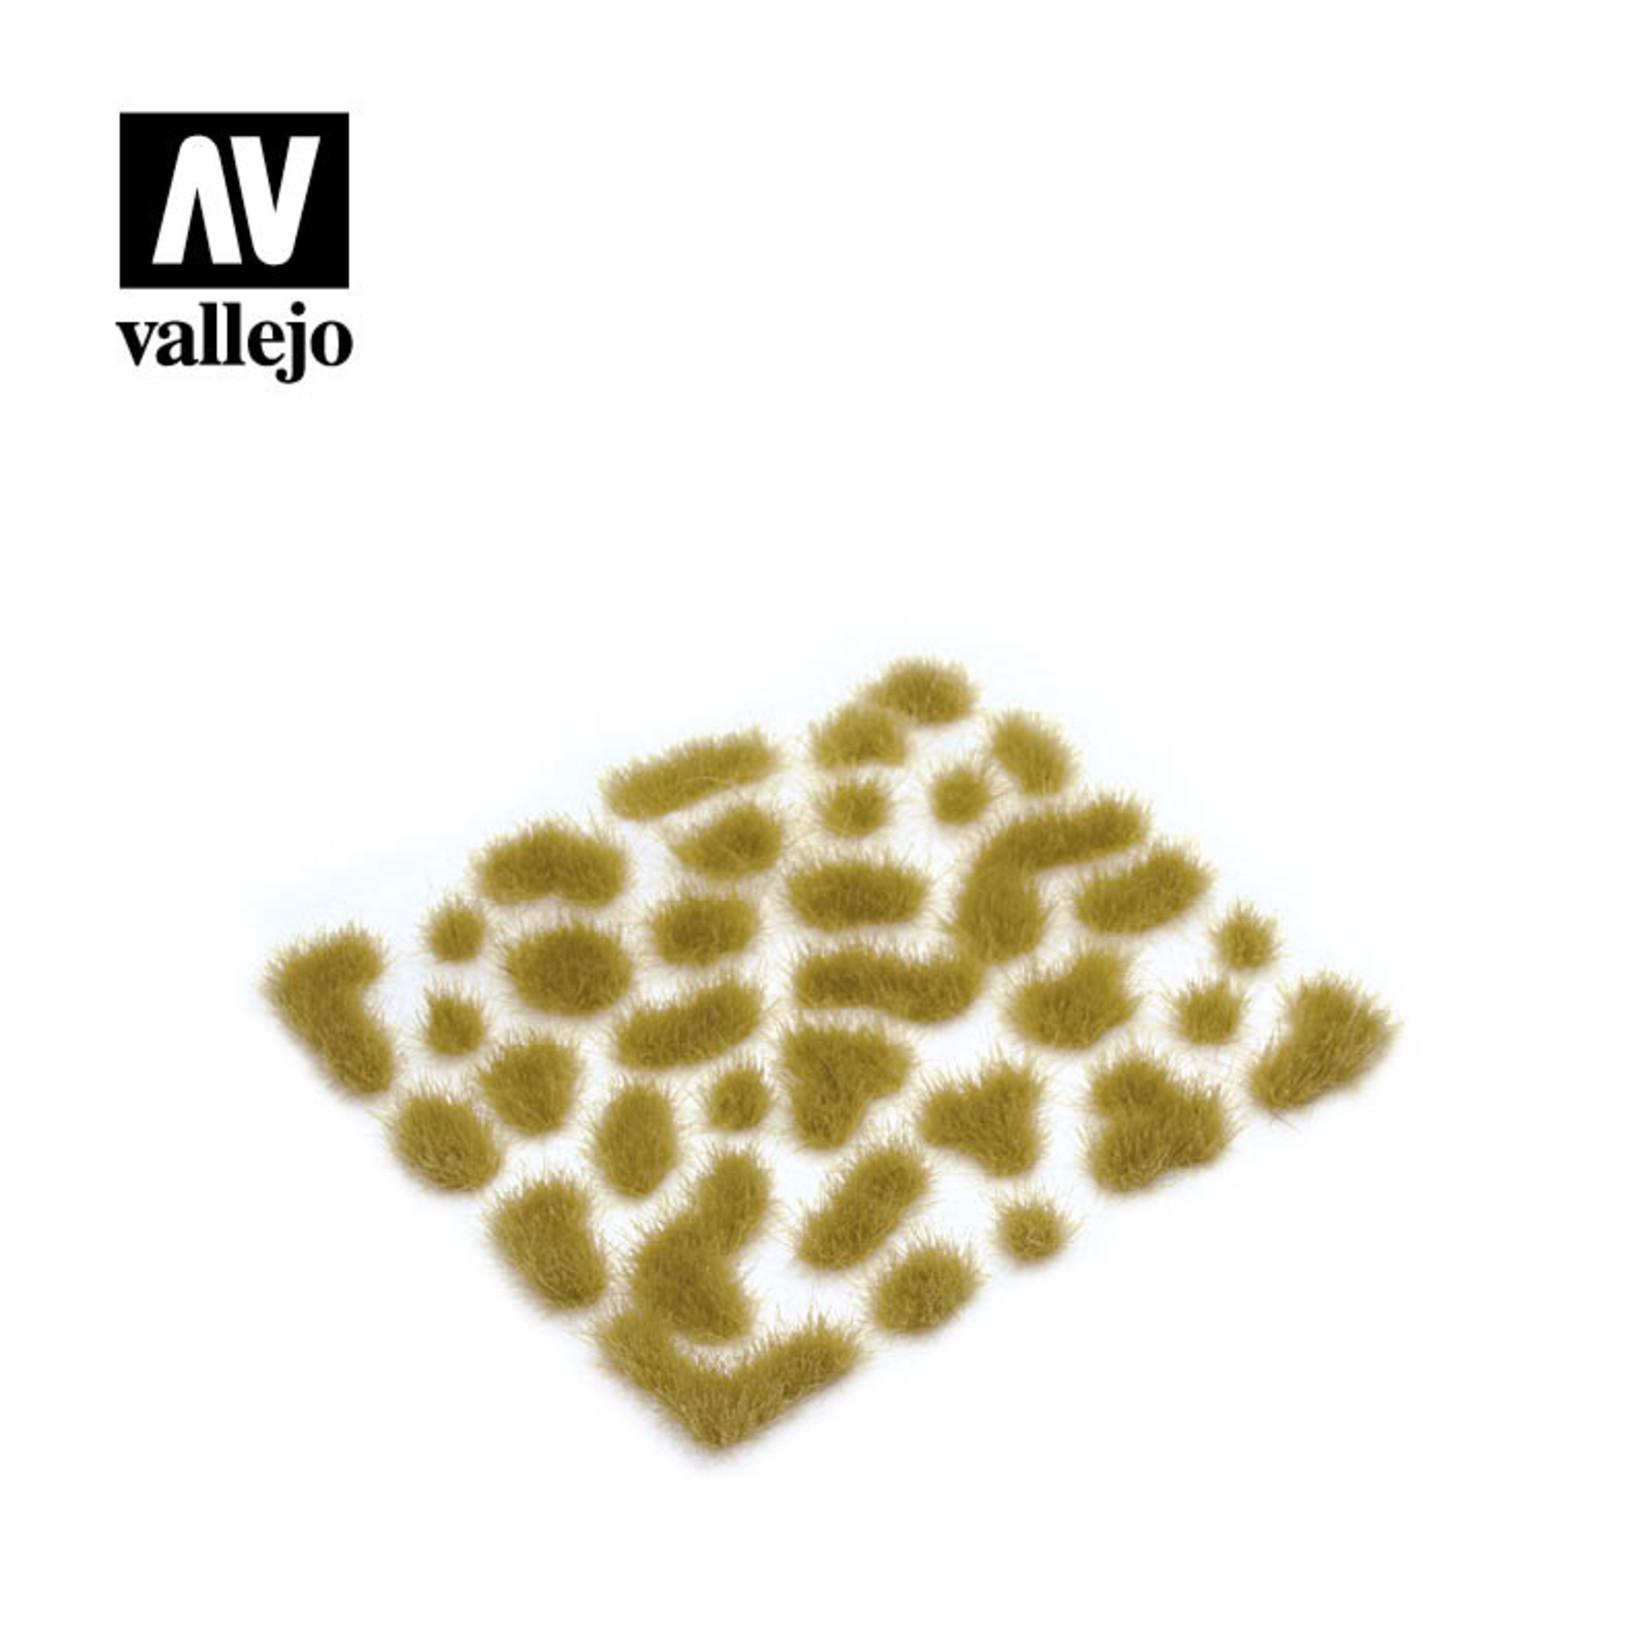 Vallejo Vallejo Scenery: Wild Tuft: Beige: Medium